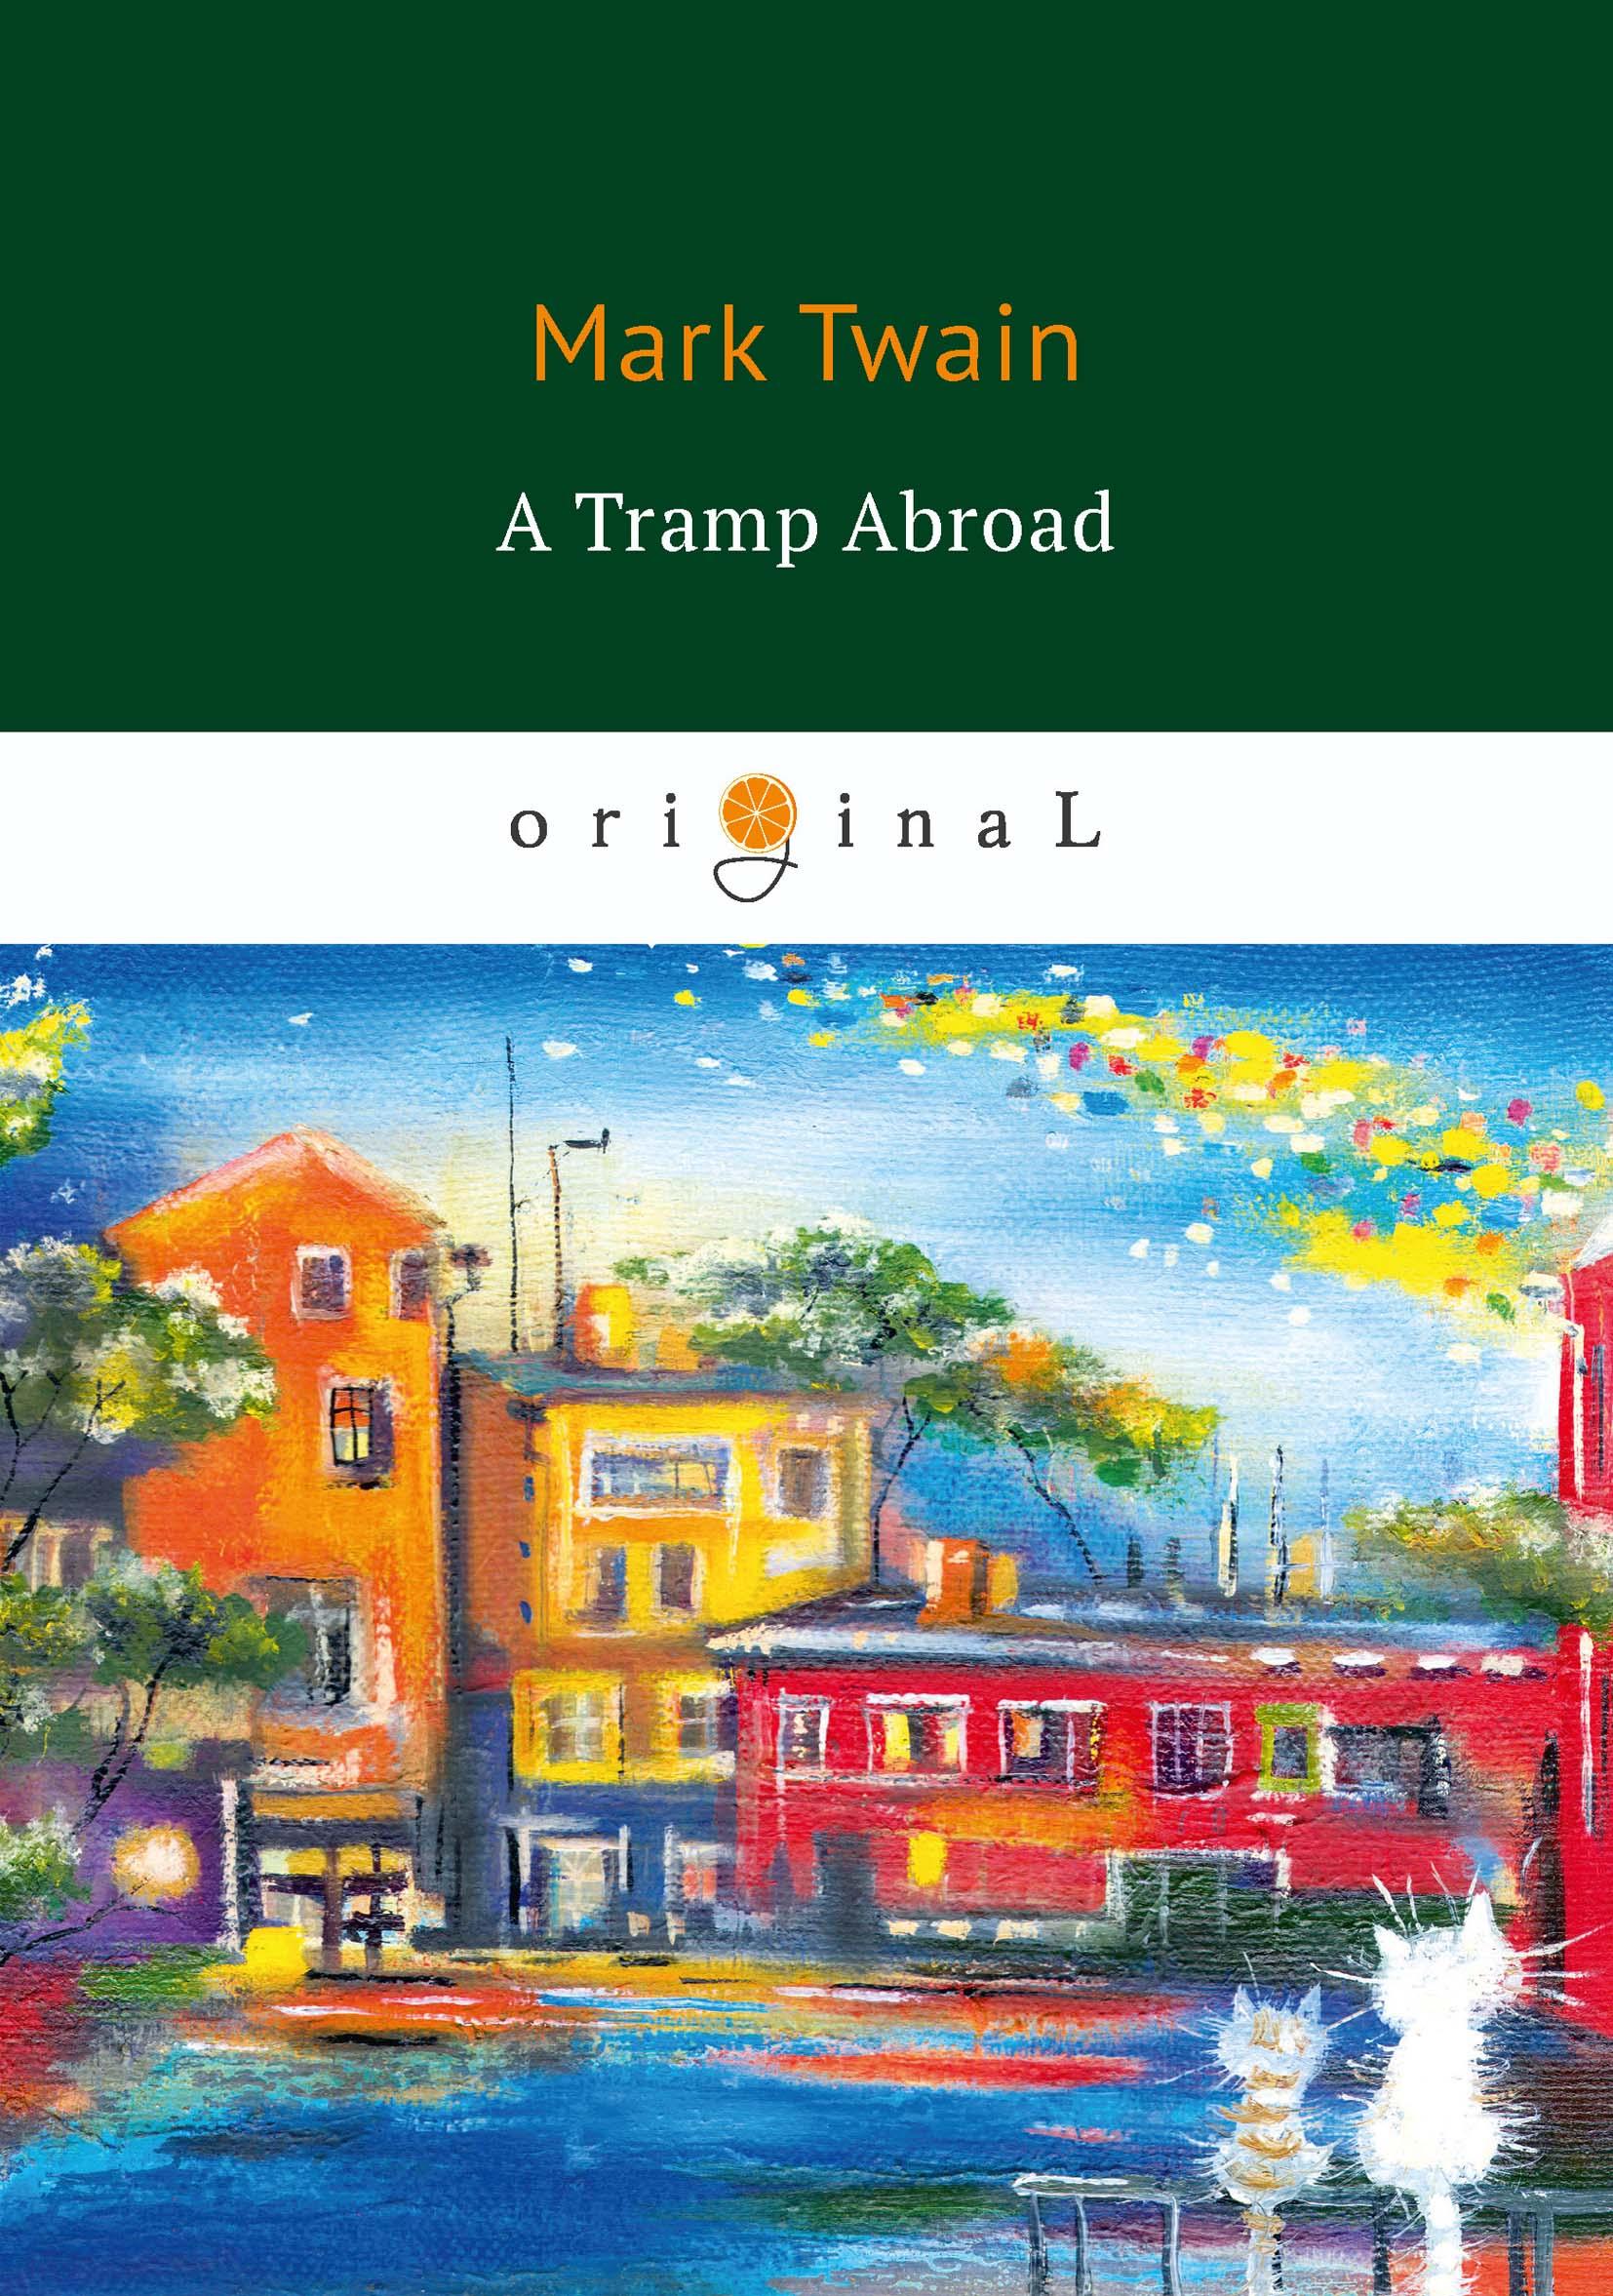 M. Twain A Tramp Abroad mark twain a tramp abroad